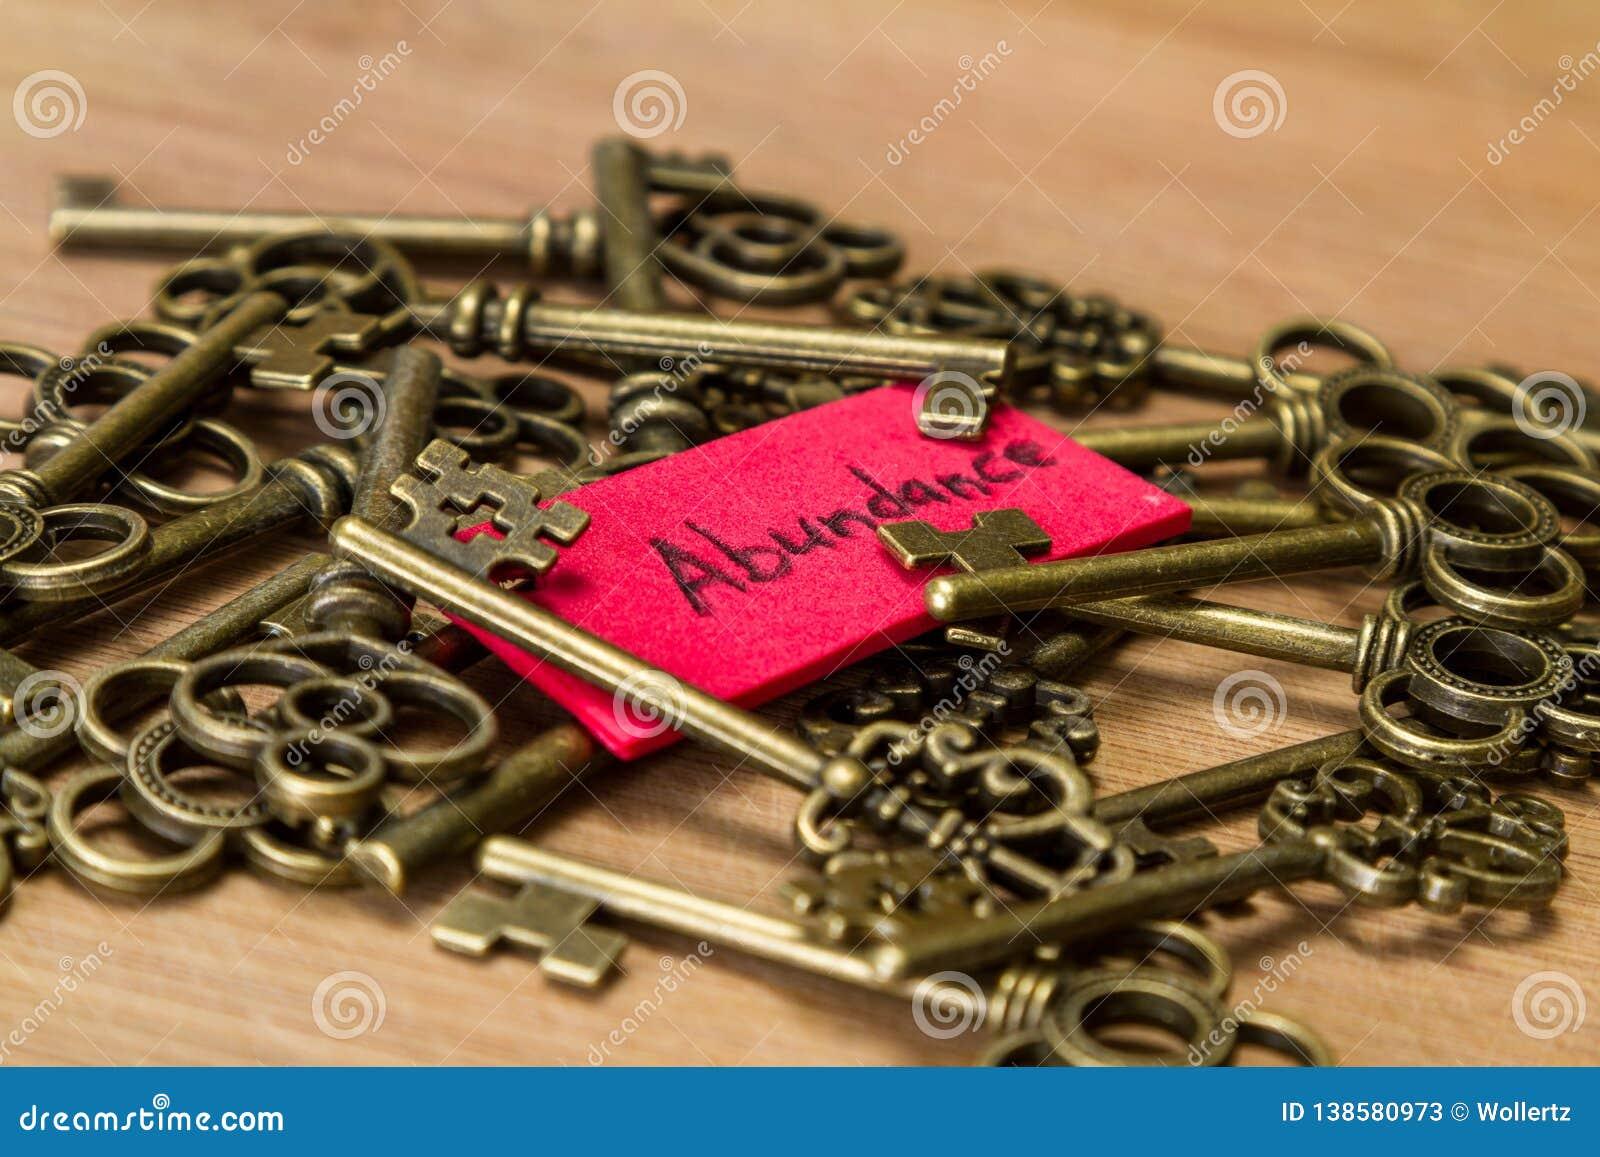 Ключи к обилию